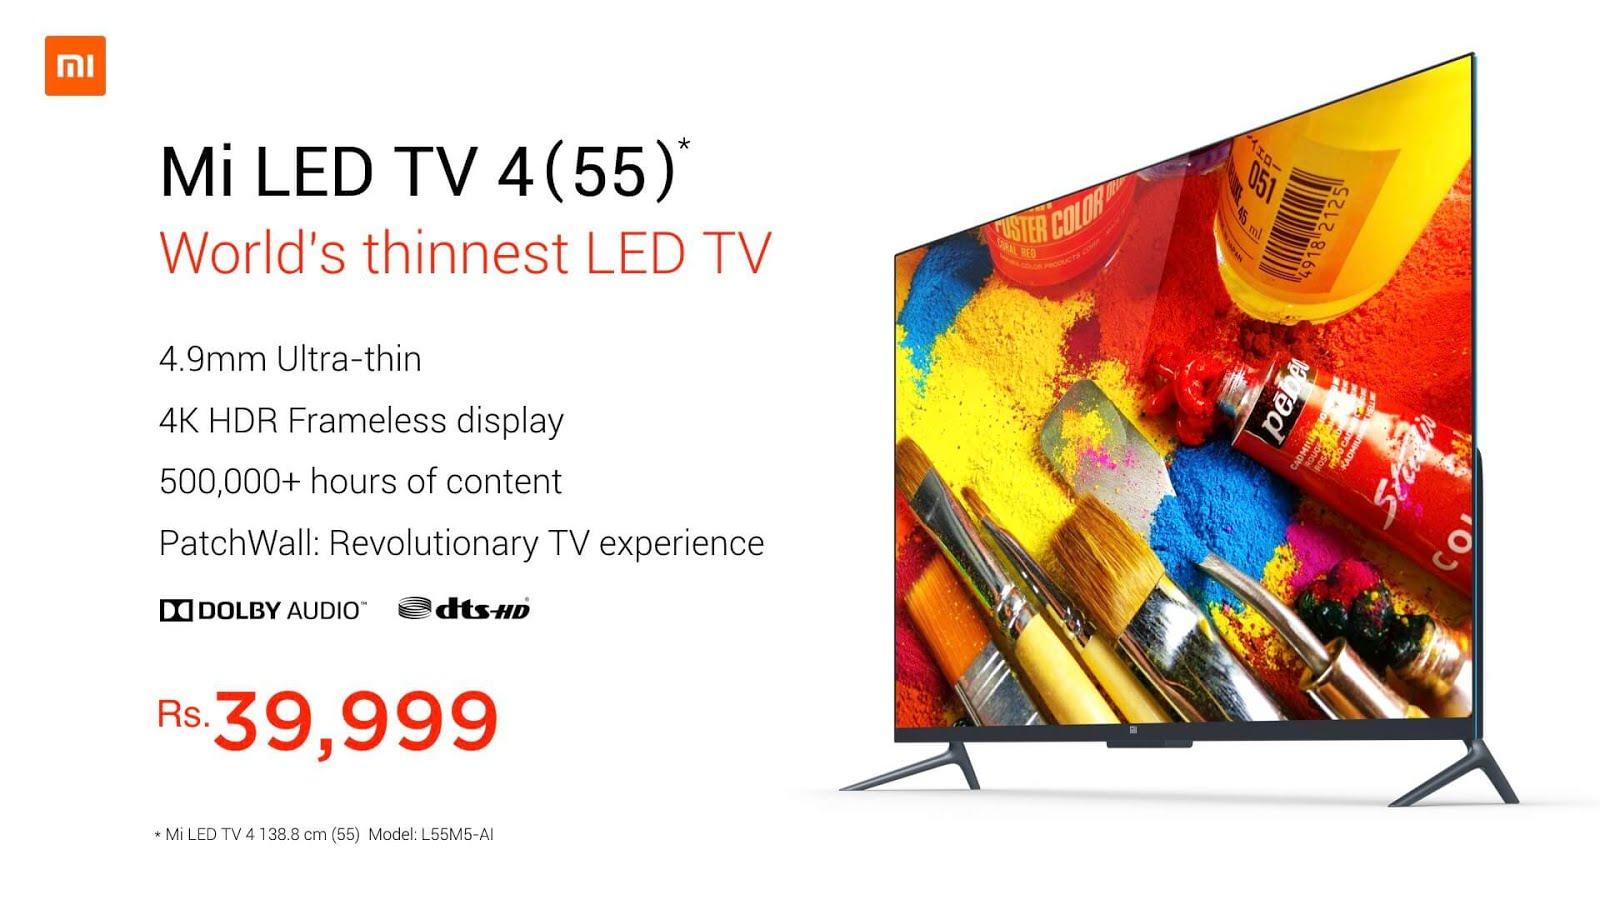 Xiaomi Mi LED TV 4